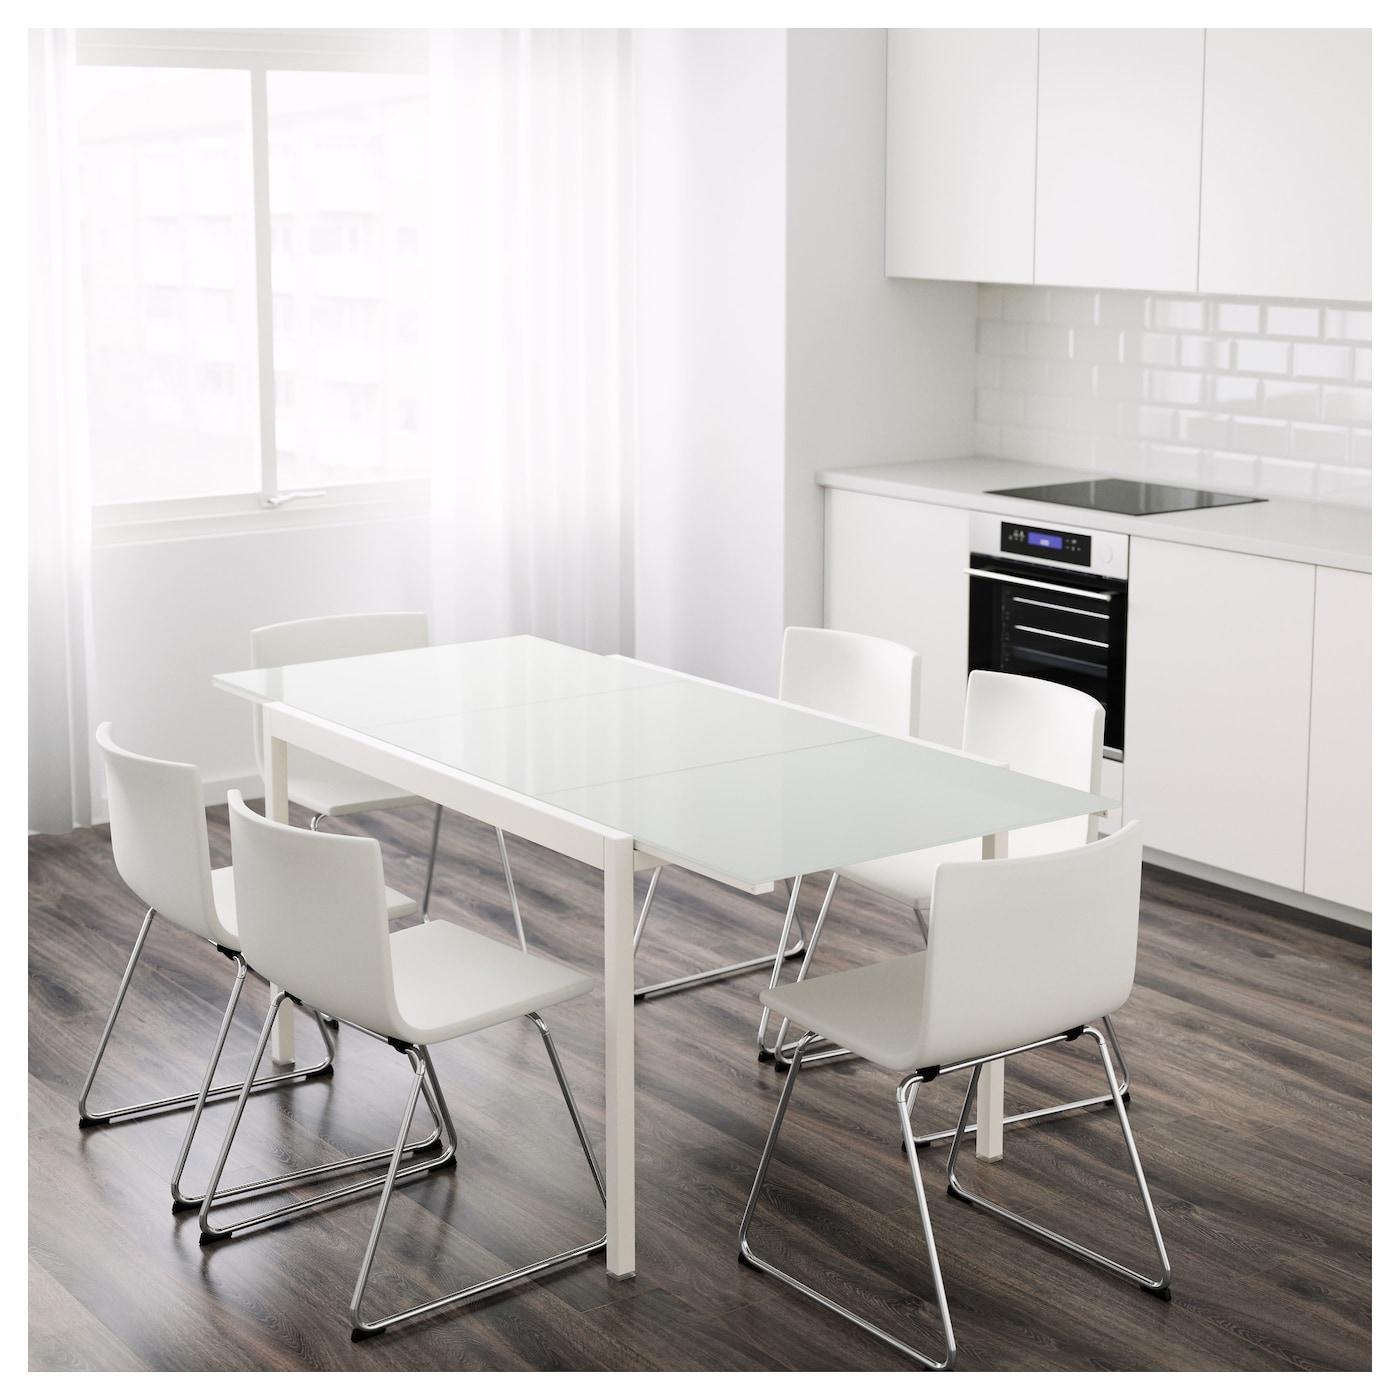 glivarp extendable table white 125 188 x 85 cm ikea. Black Bedroom Furniture Sets. Home Design Ideas